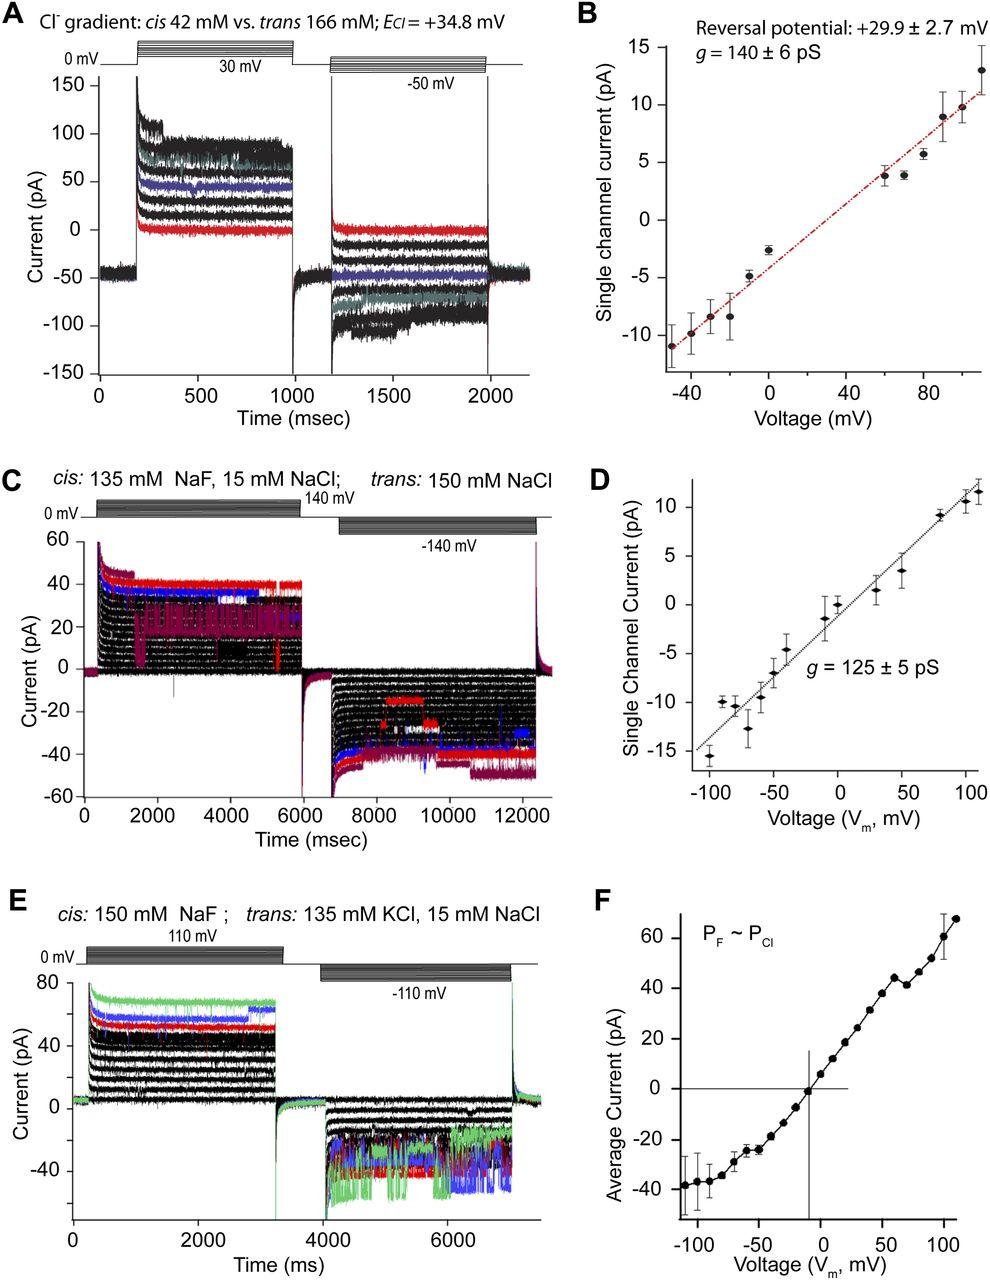 Secretory Granule Protein Chromogranin B Chgb Forms An Anion Categorybandreject Filter Circuits Wikimedia Commons Download Figure